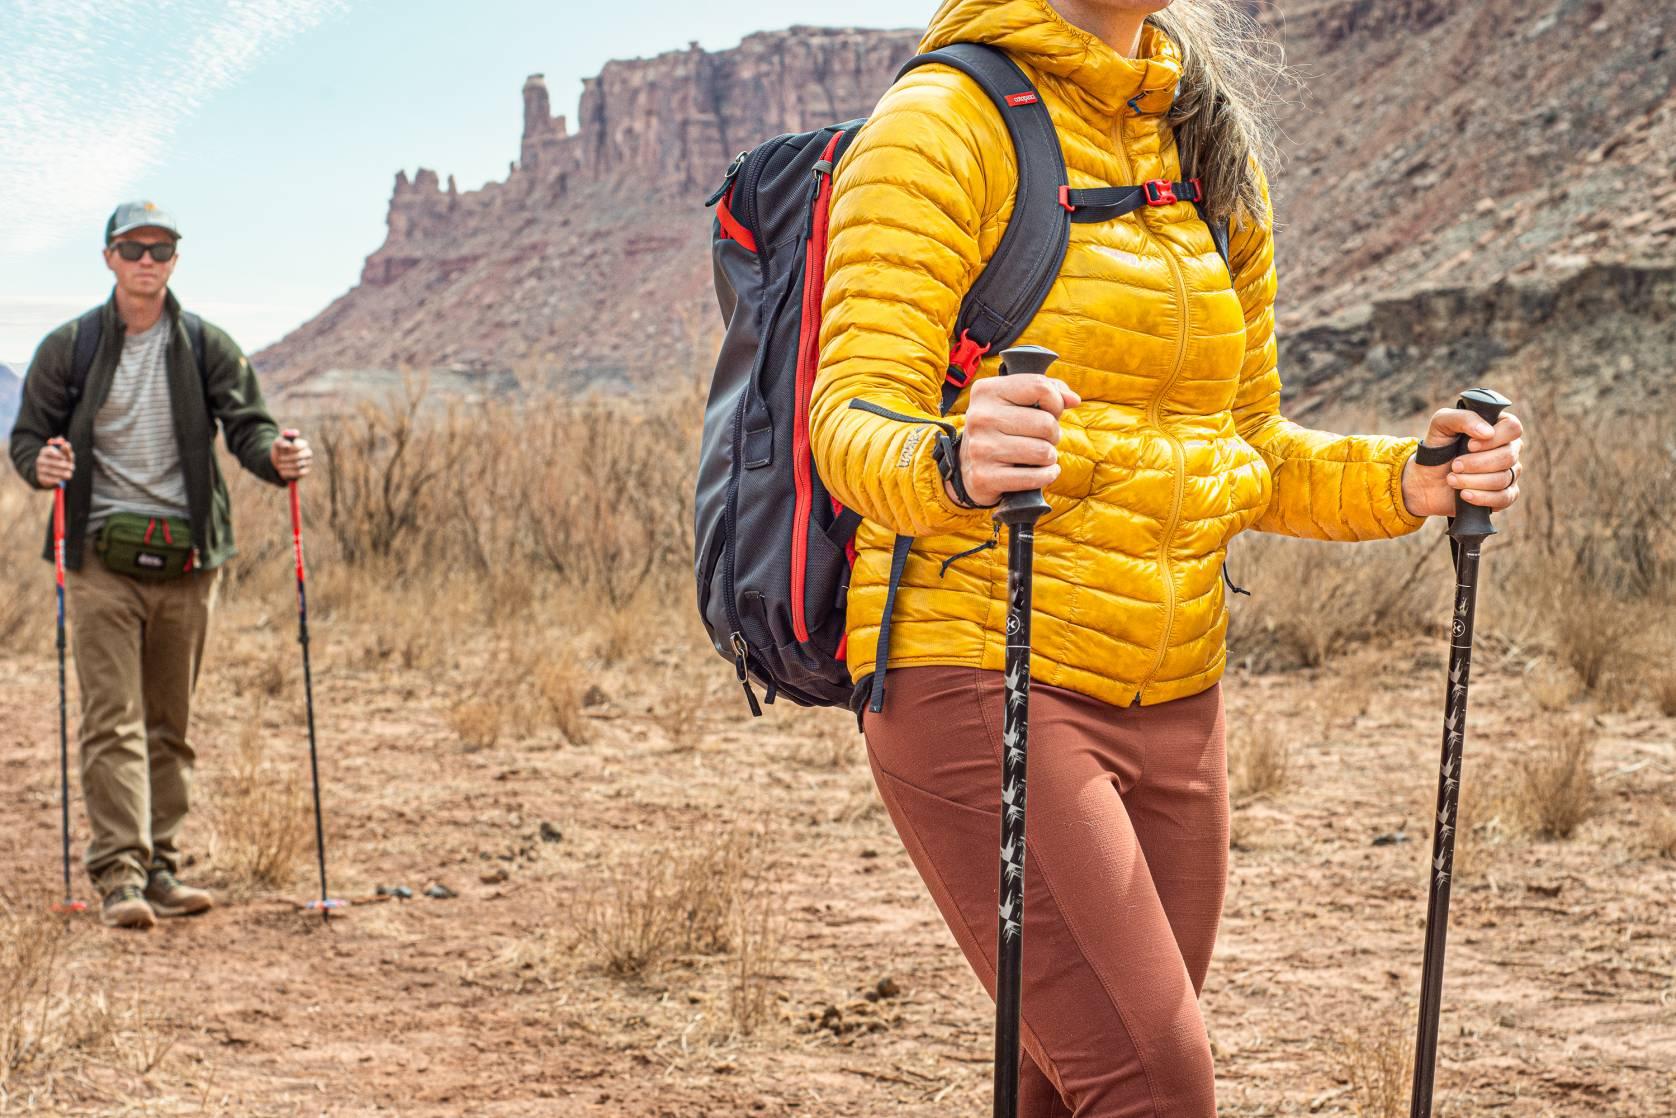 Testing trekking poles while hiking near Moab.